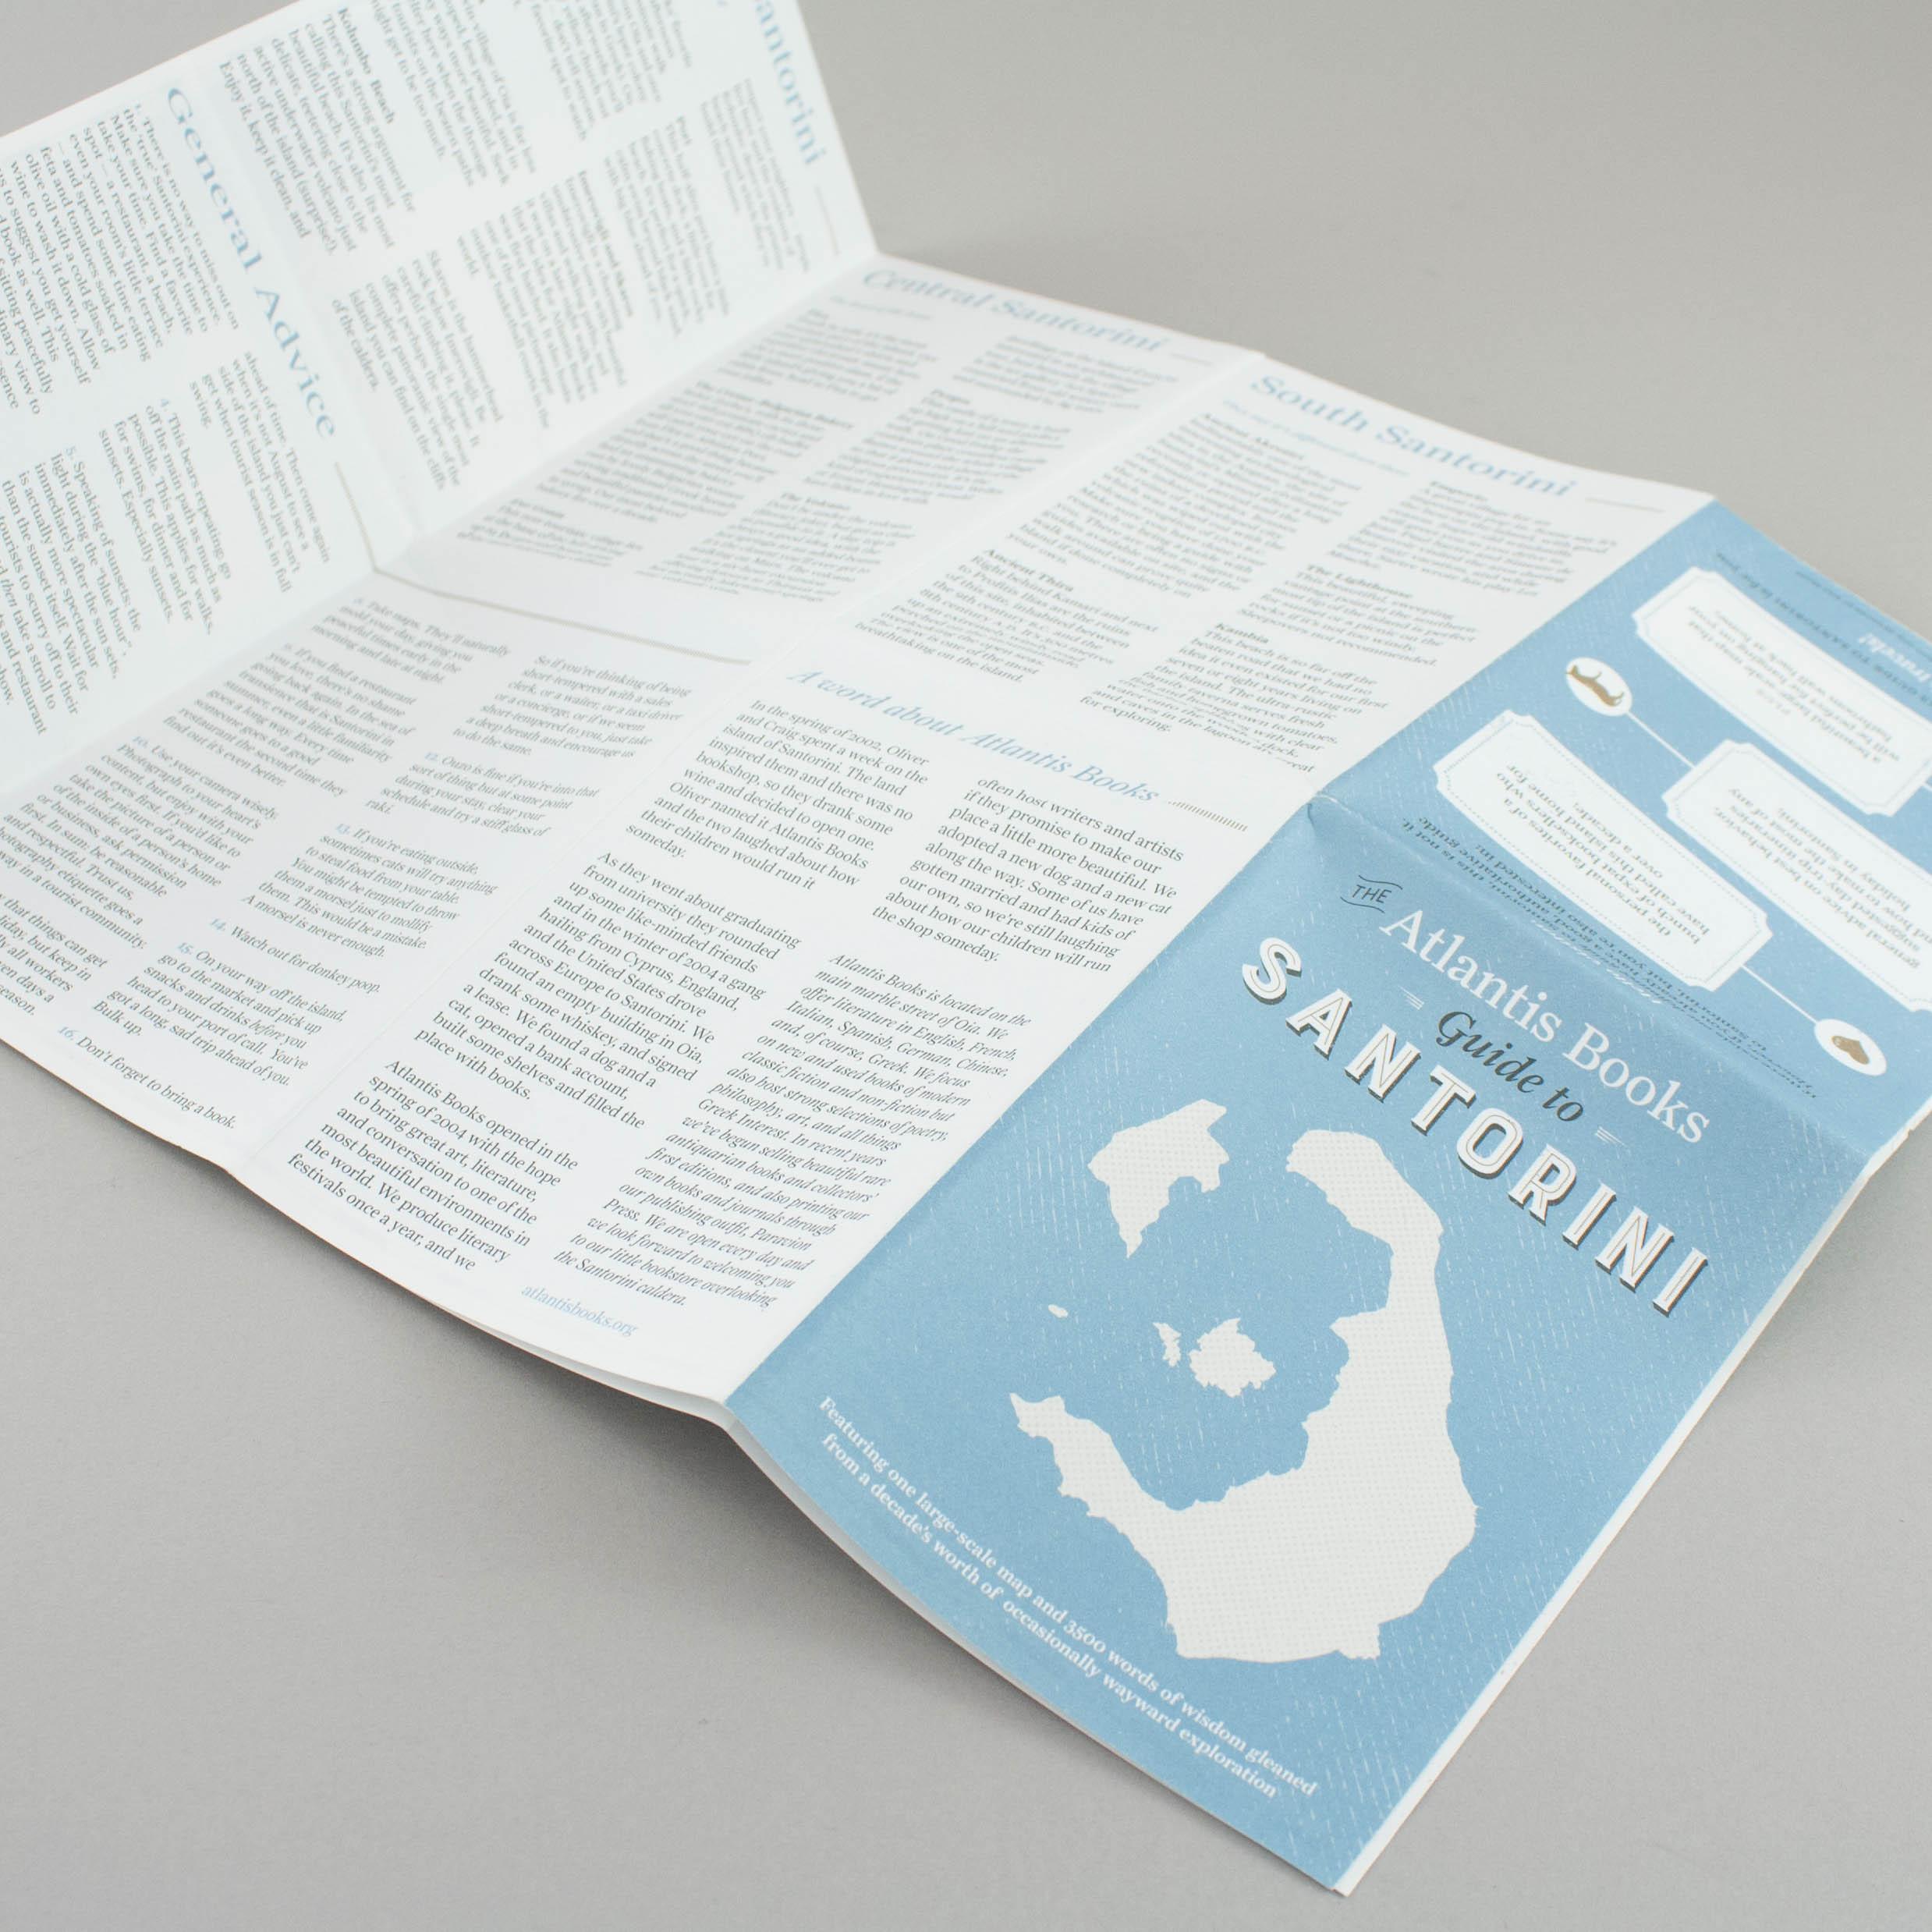 The Atlantis Books Guide to Santorini – Atlantis Books on santorini shopping, santorini greece location, santorini sunset greece wallpaper, santorini volcano location,